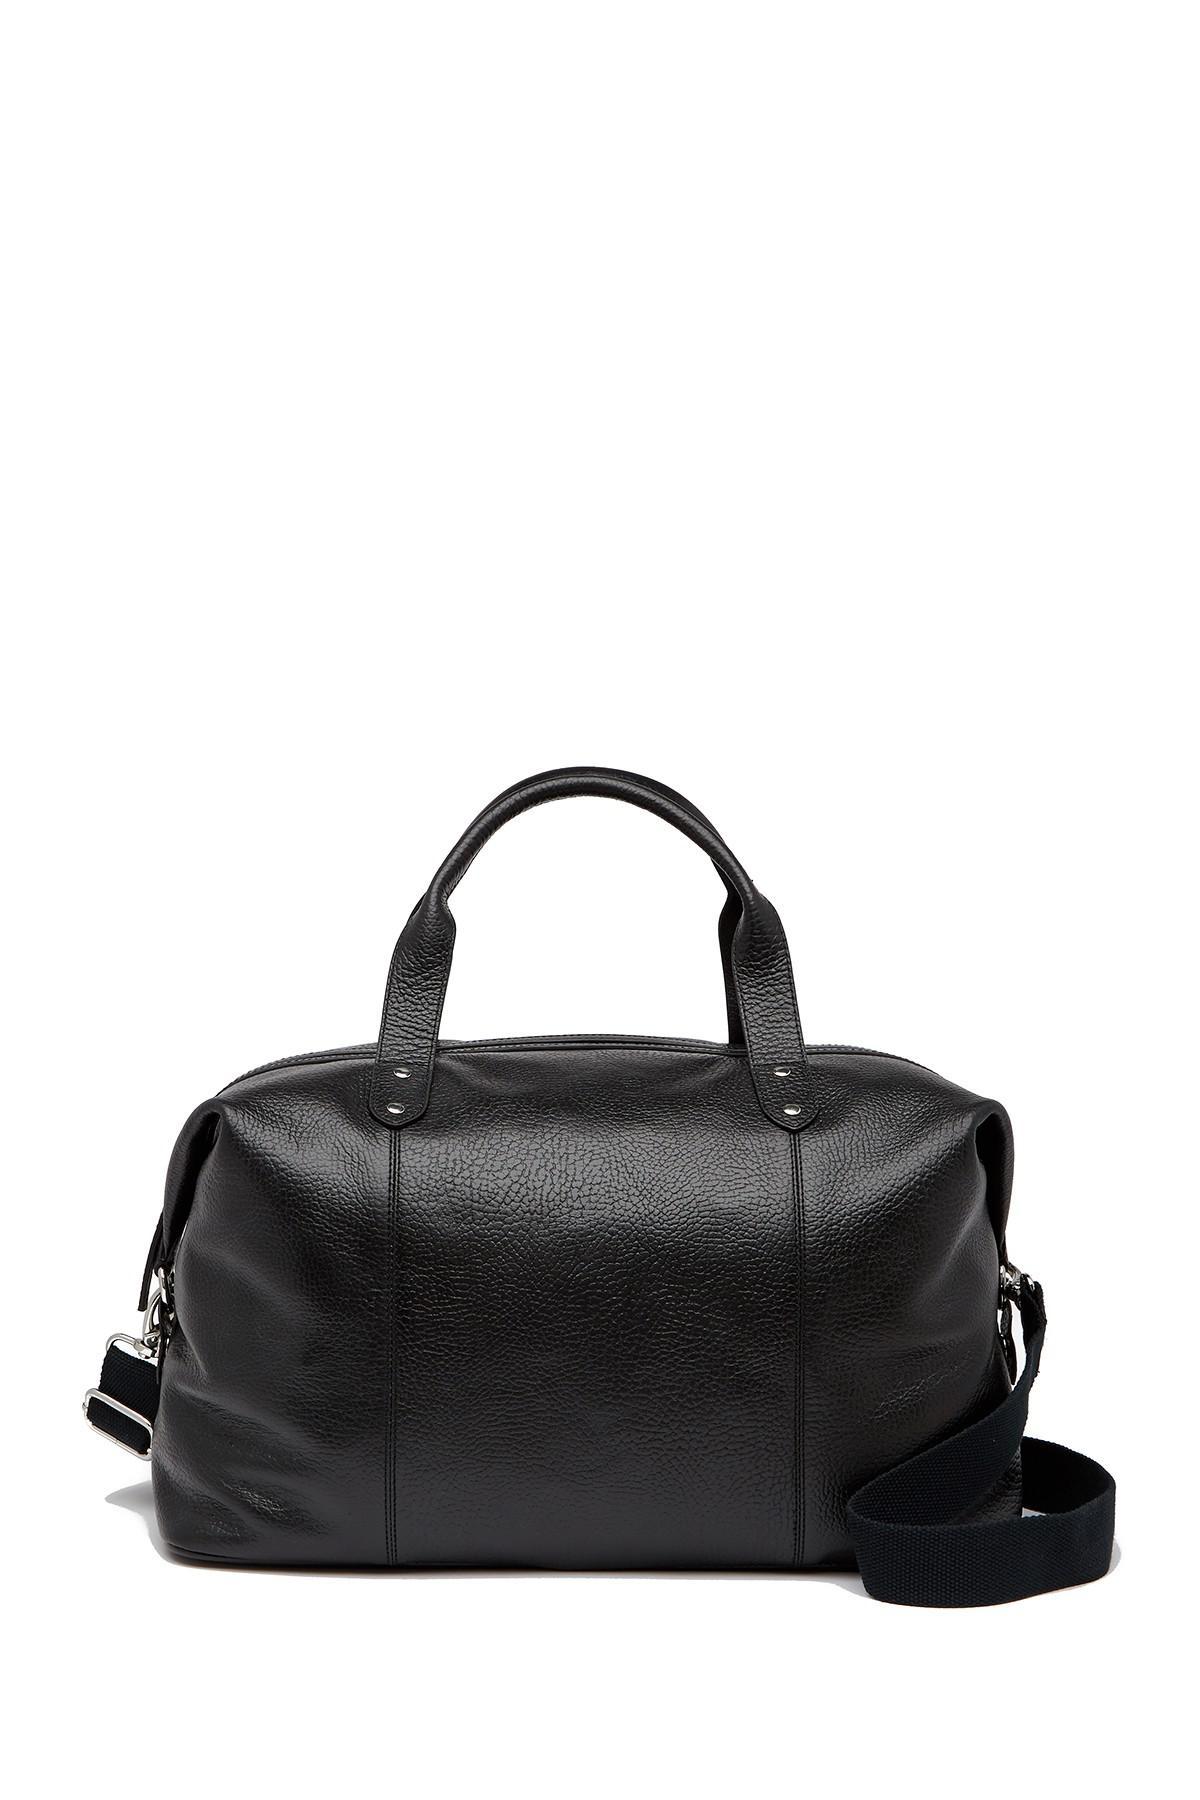 Lyst - Cole Haan Saunders Leather Duffel Bag in Black for Men b77daffbecc45